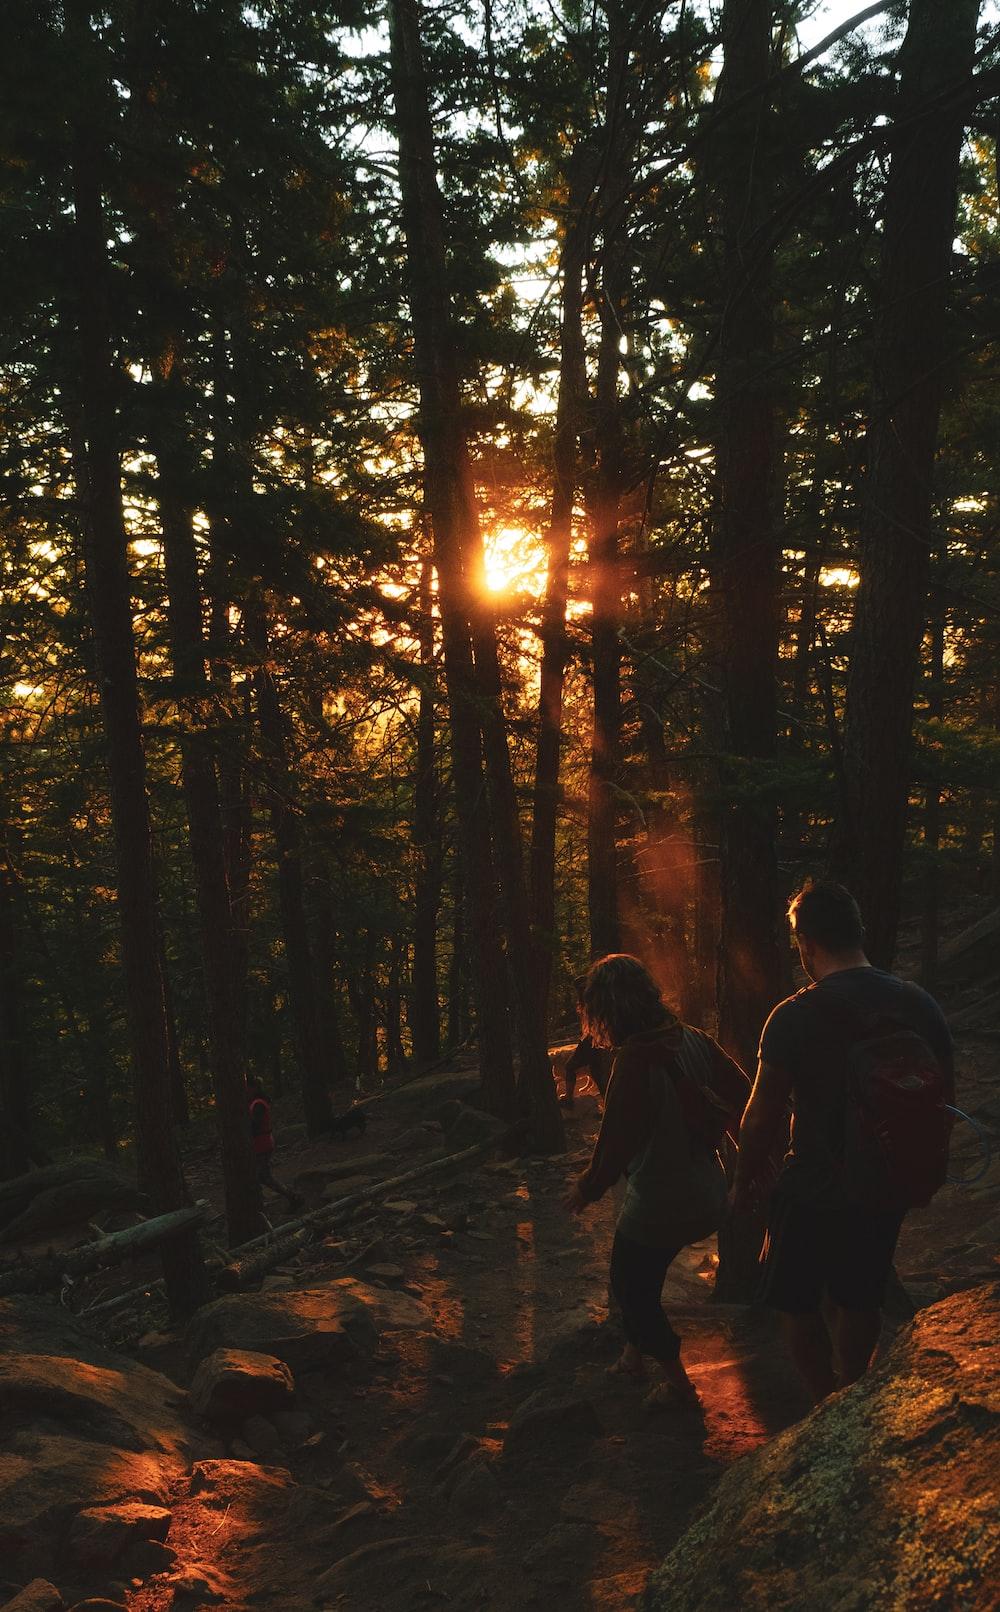 man and woman walking towards trees